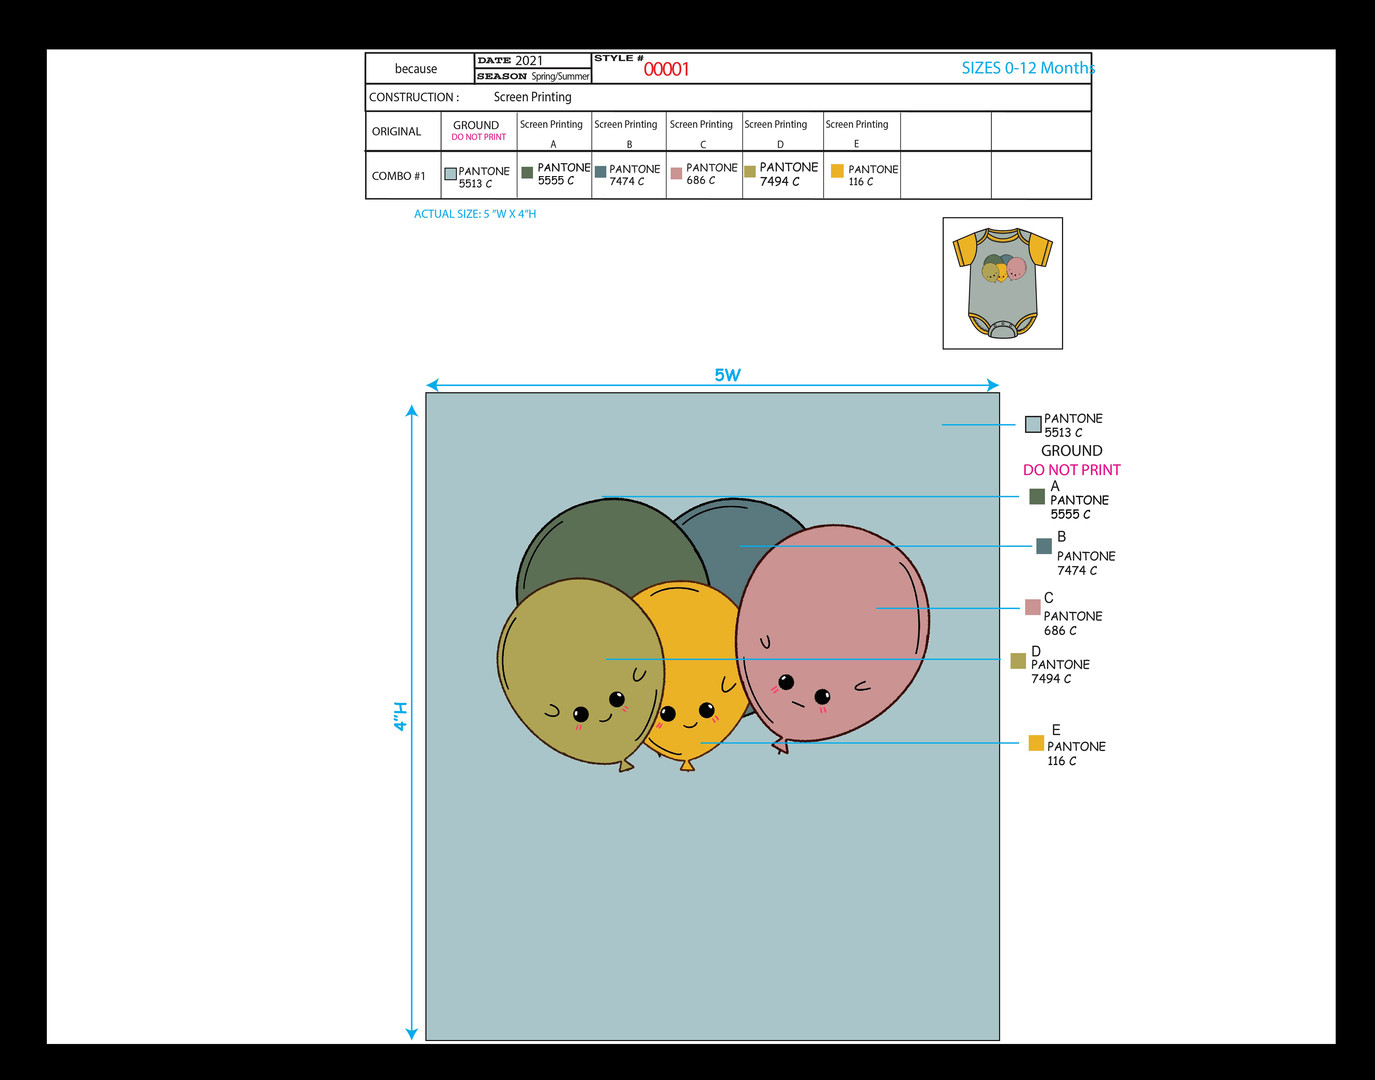 Ibrahim_DigitalLayette_Page_08_Image_000